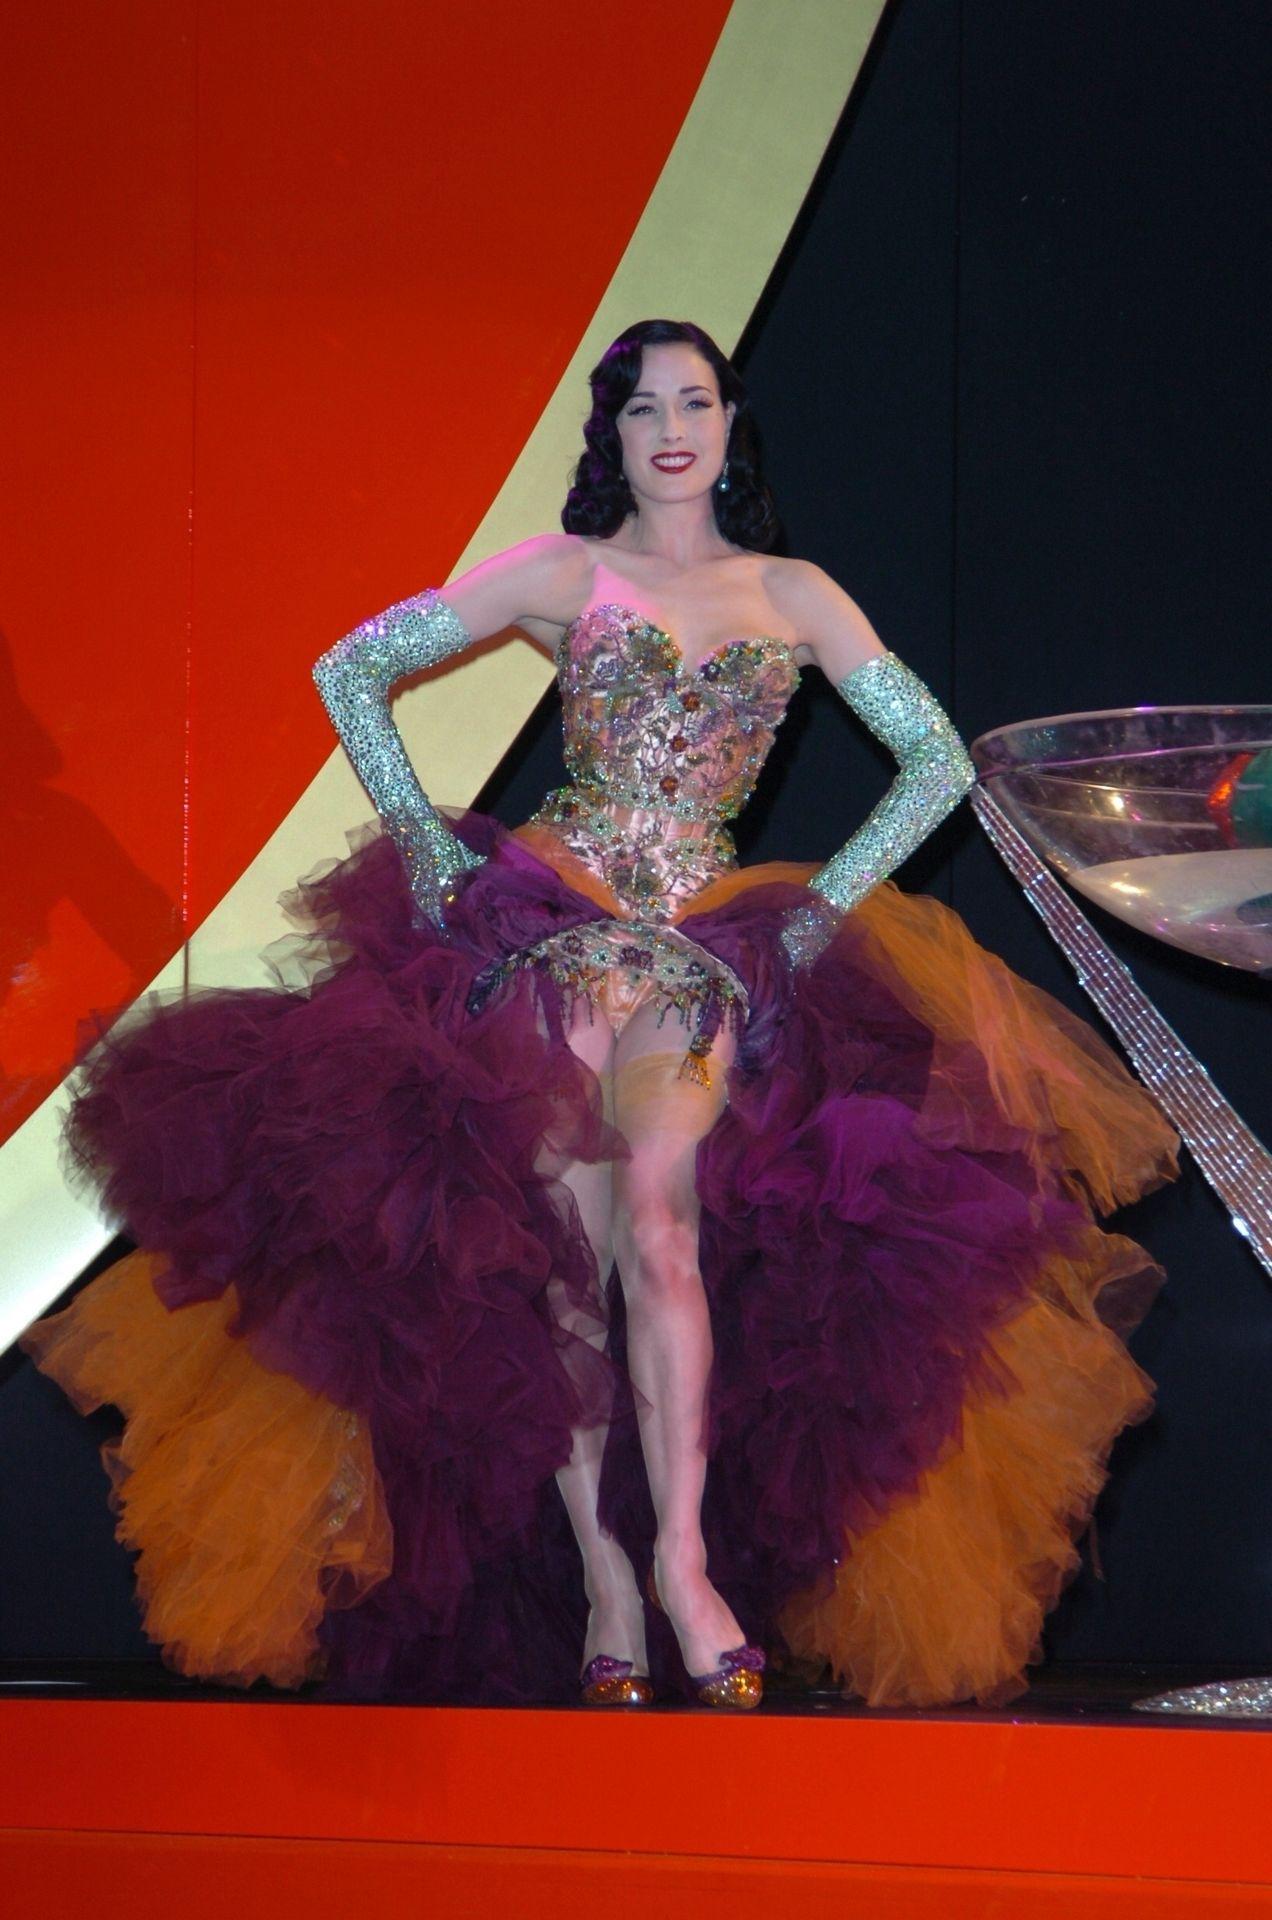 Dita Von Teese Performs At Erotica 06 In London 0007